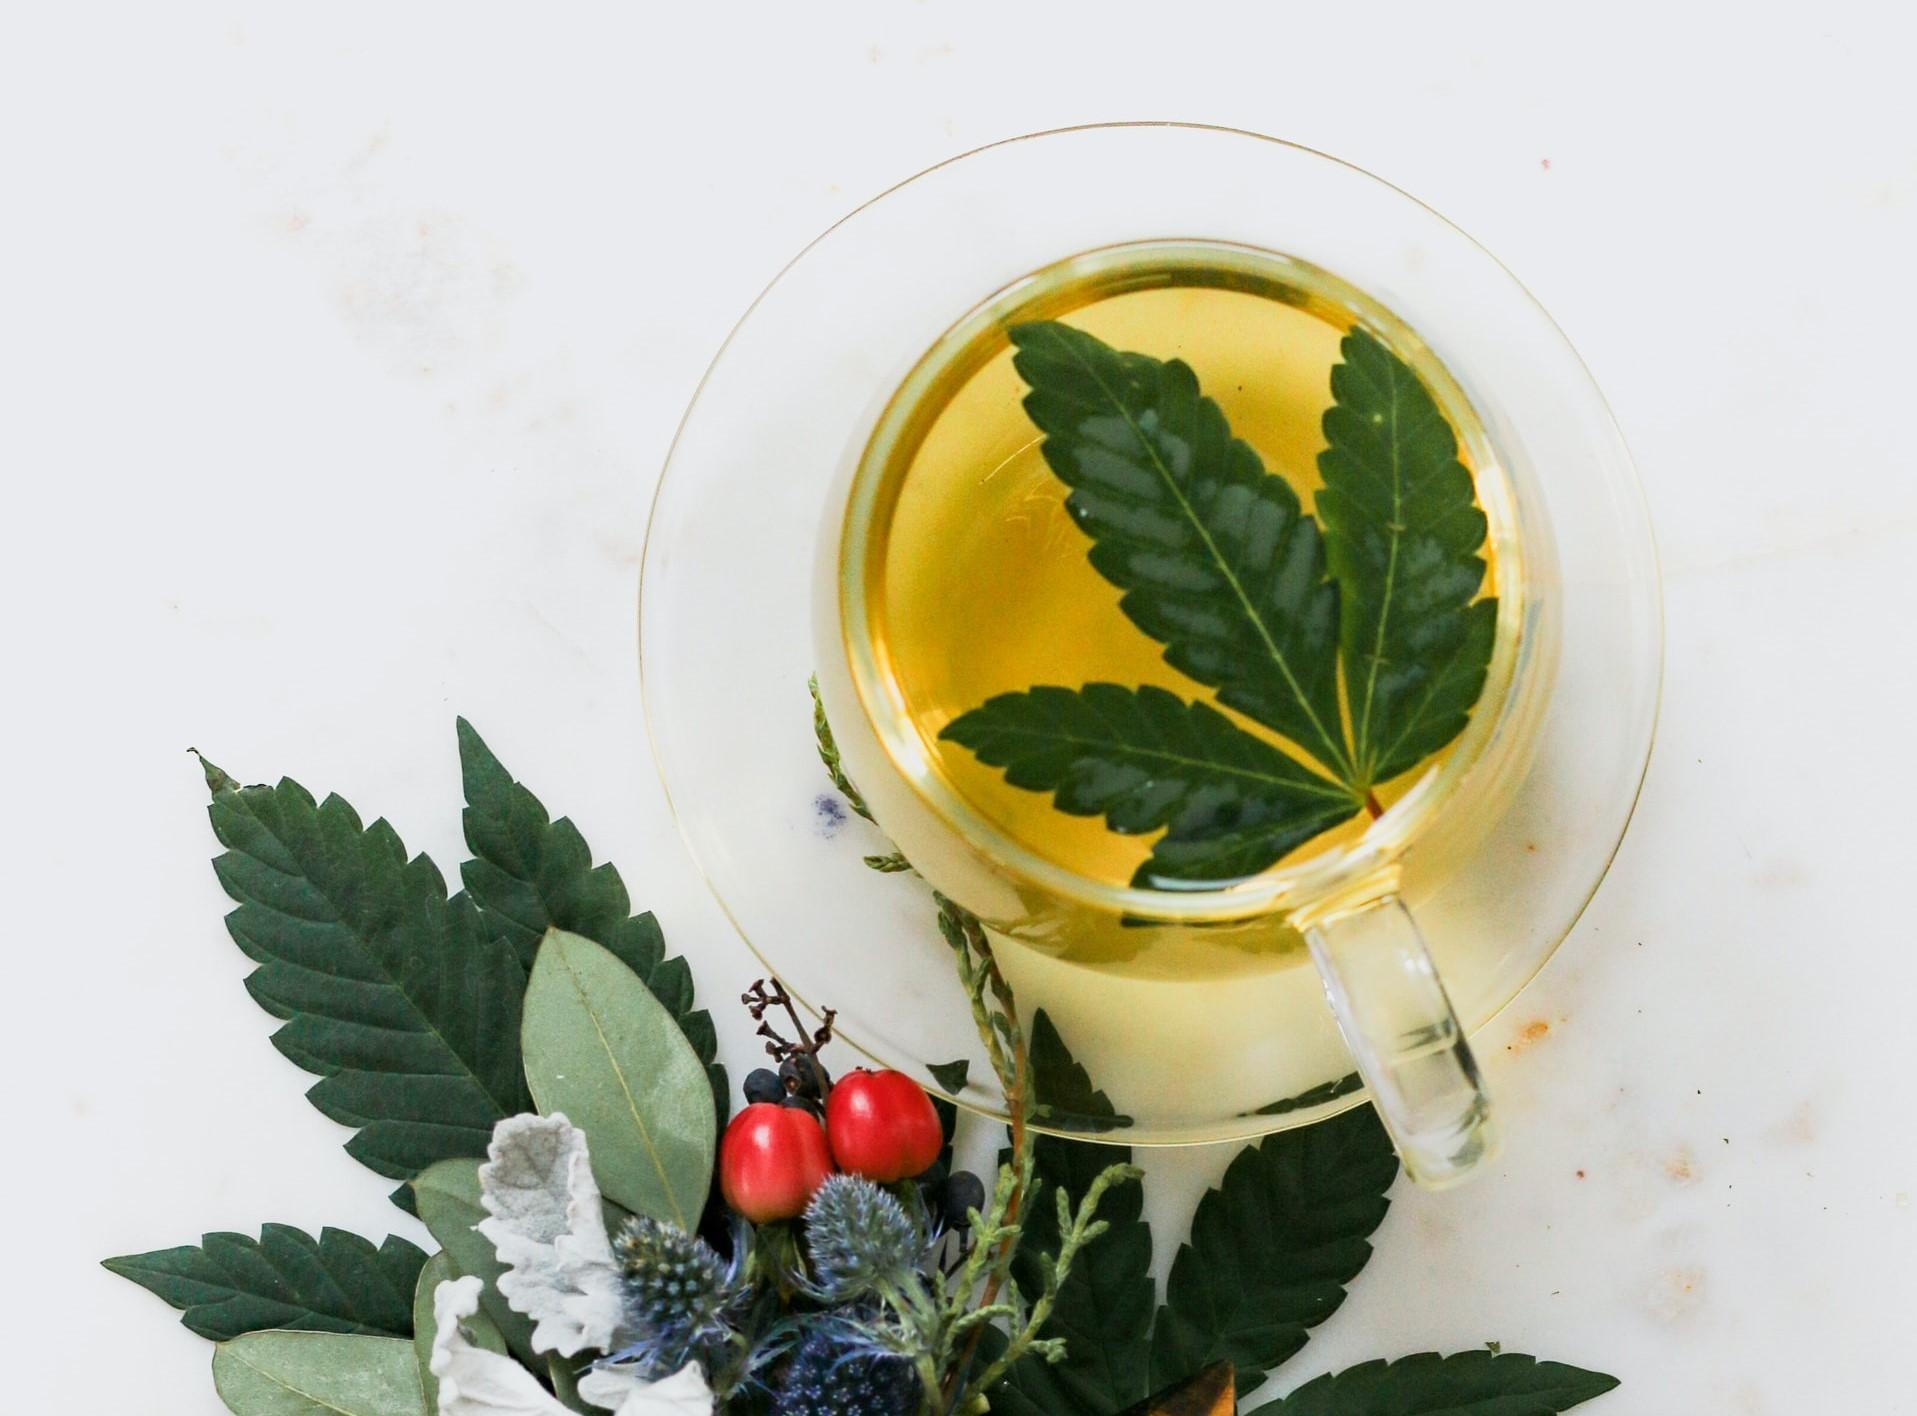 marijuana leaf in glass of tea